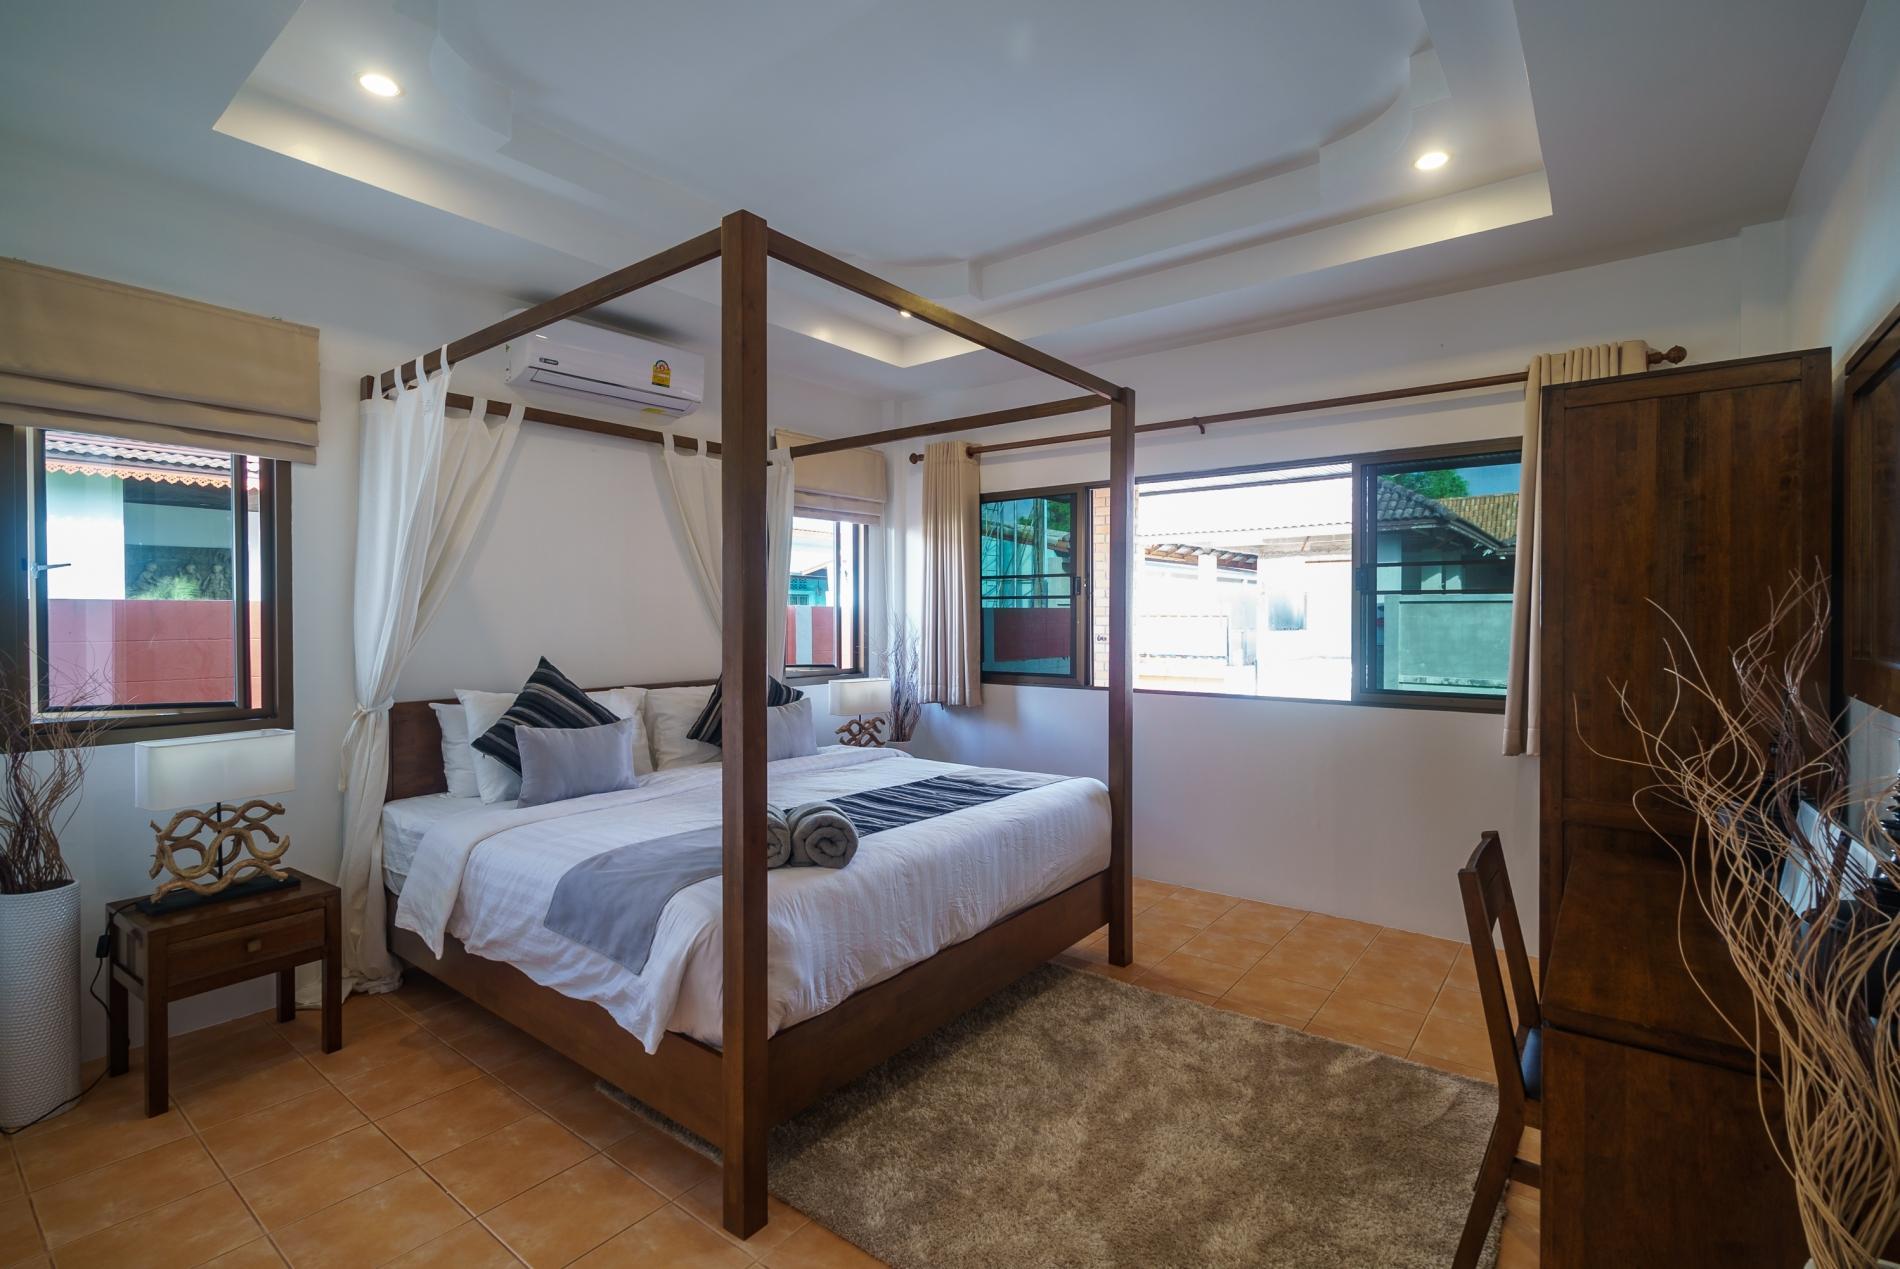 Pasak soi 3 - Convenient pool villa in quiet location, near Laguna, Boat avenue photo 5733744